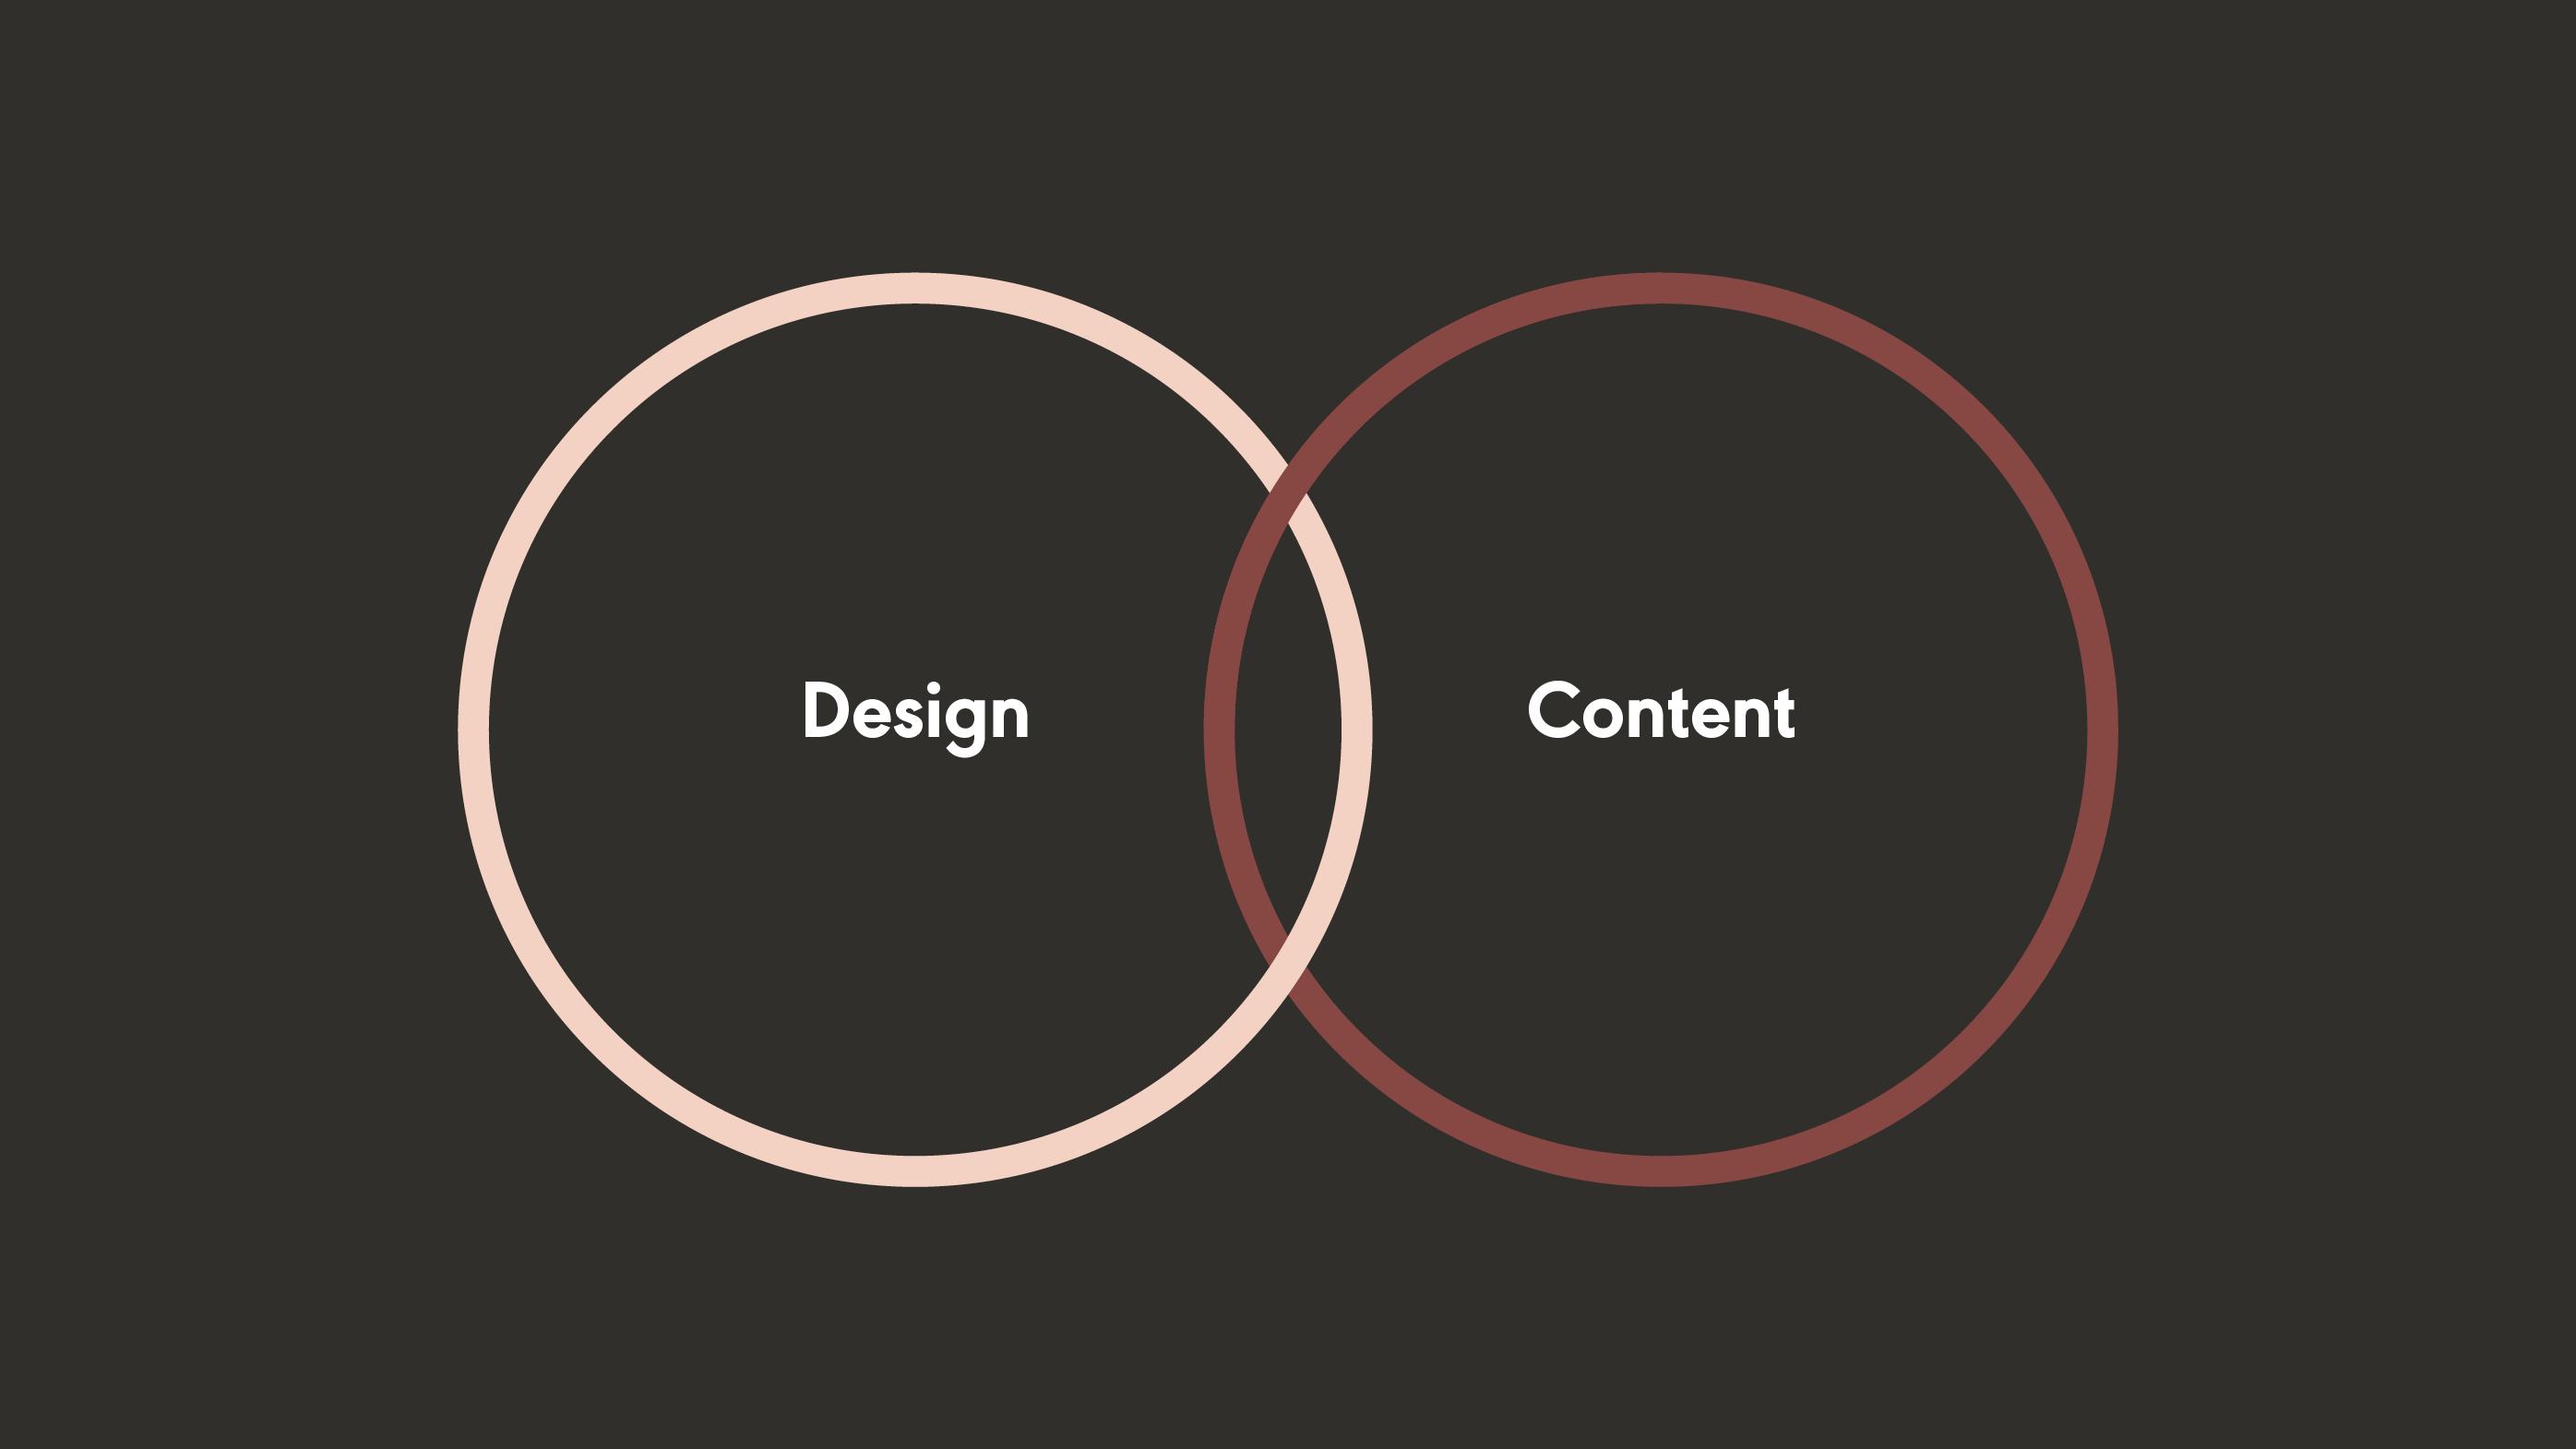 Kate diagram, content och design.